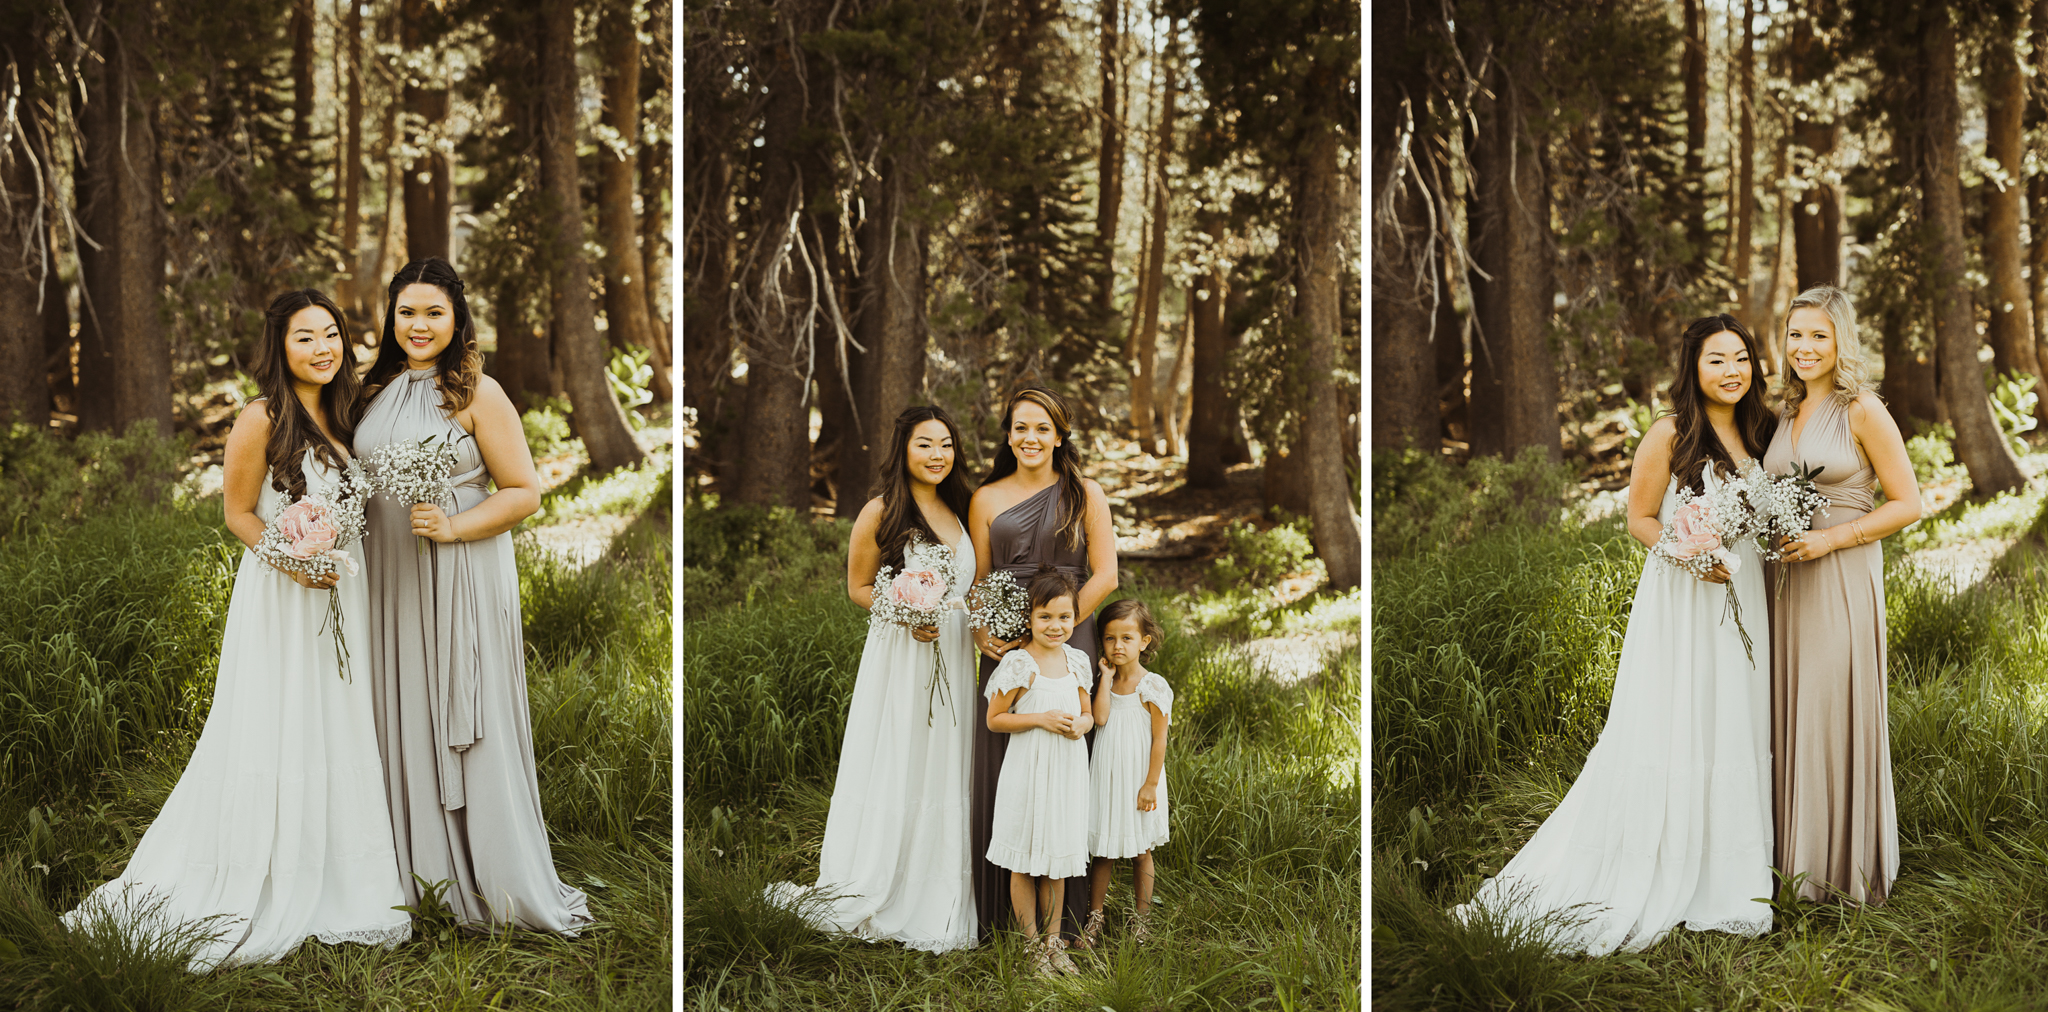 ©Isaiah & Taylor Photography -The Hideout Wedding, Kirkwood California, Lake Tahoe Wedding Photographer-125.jpg